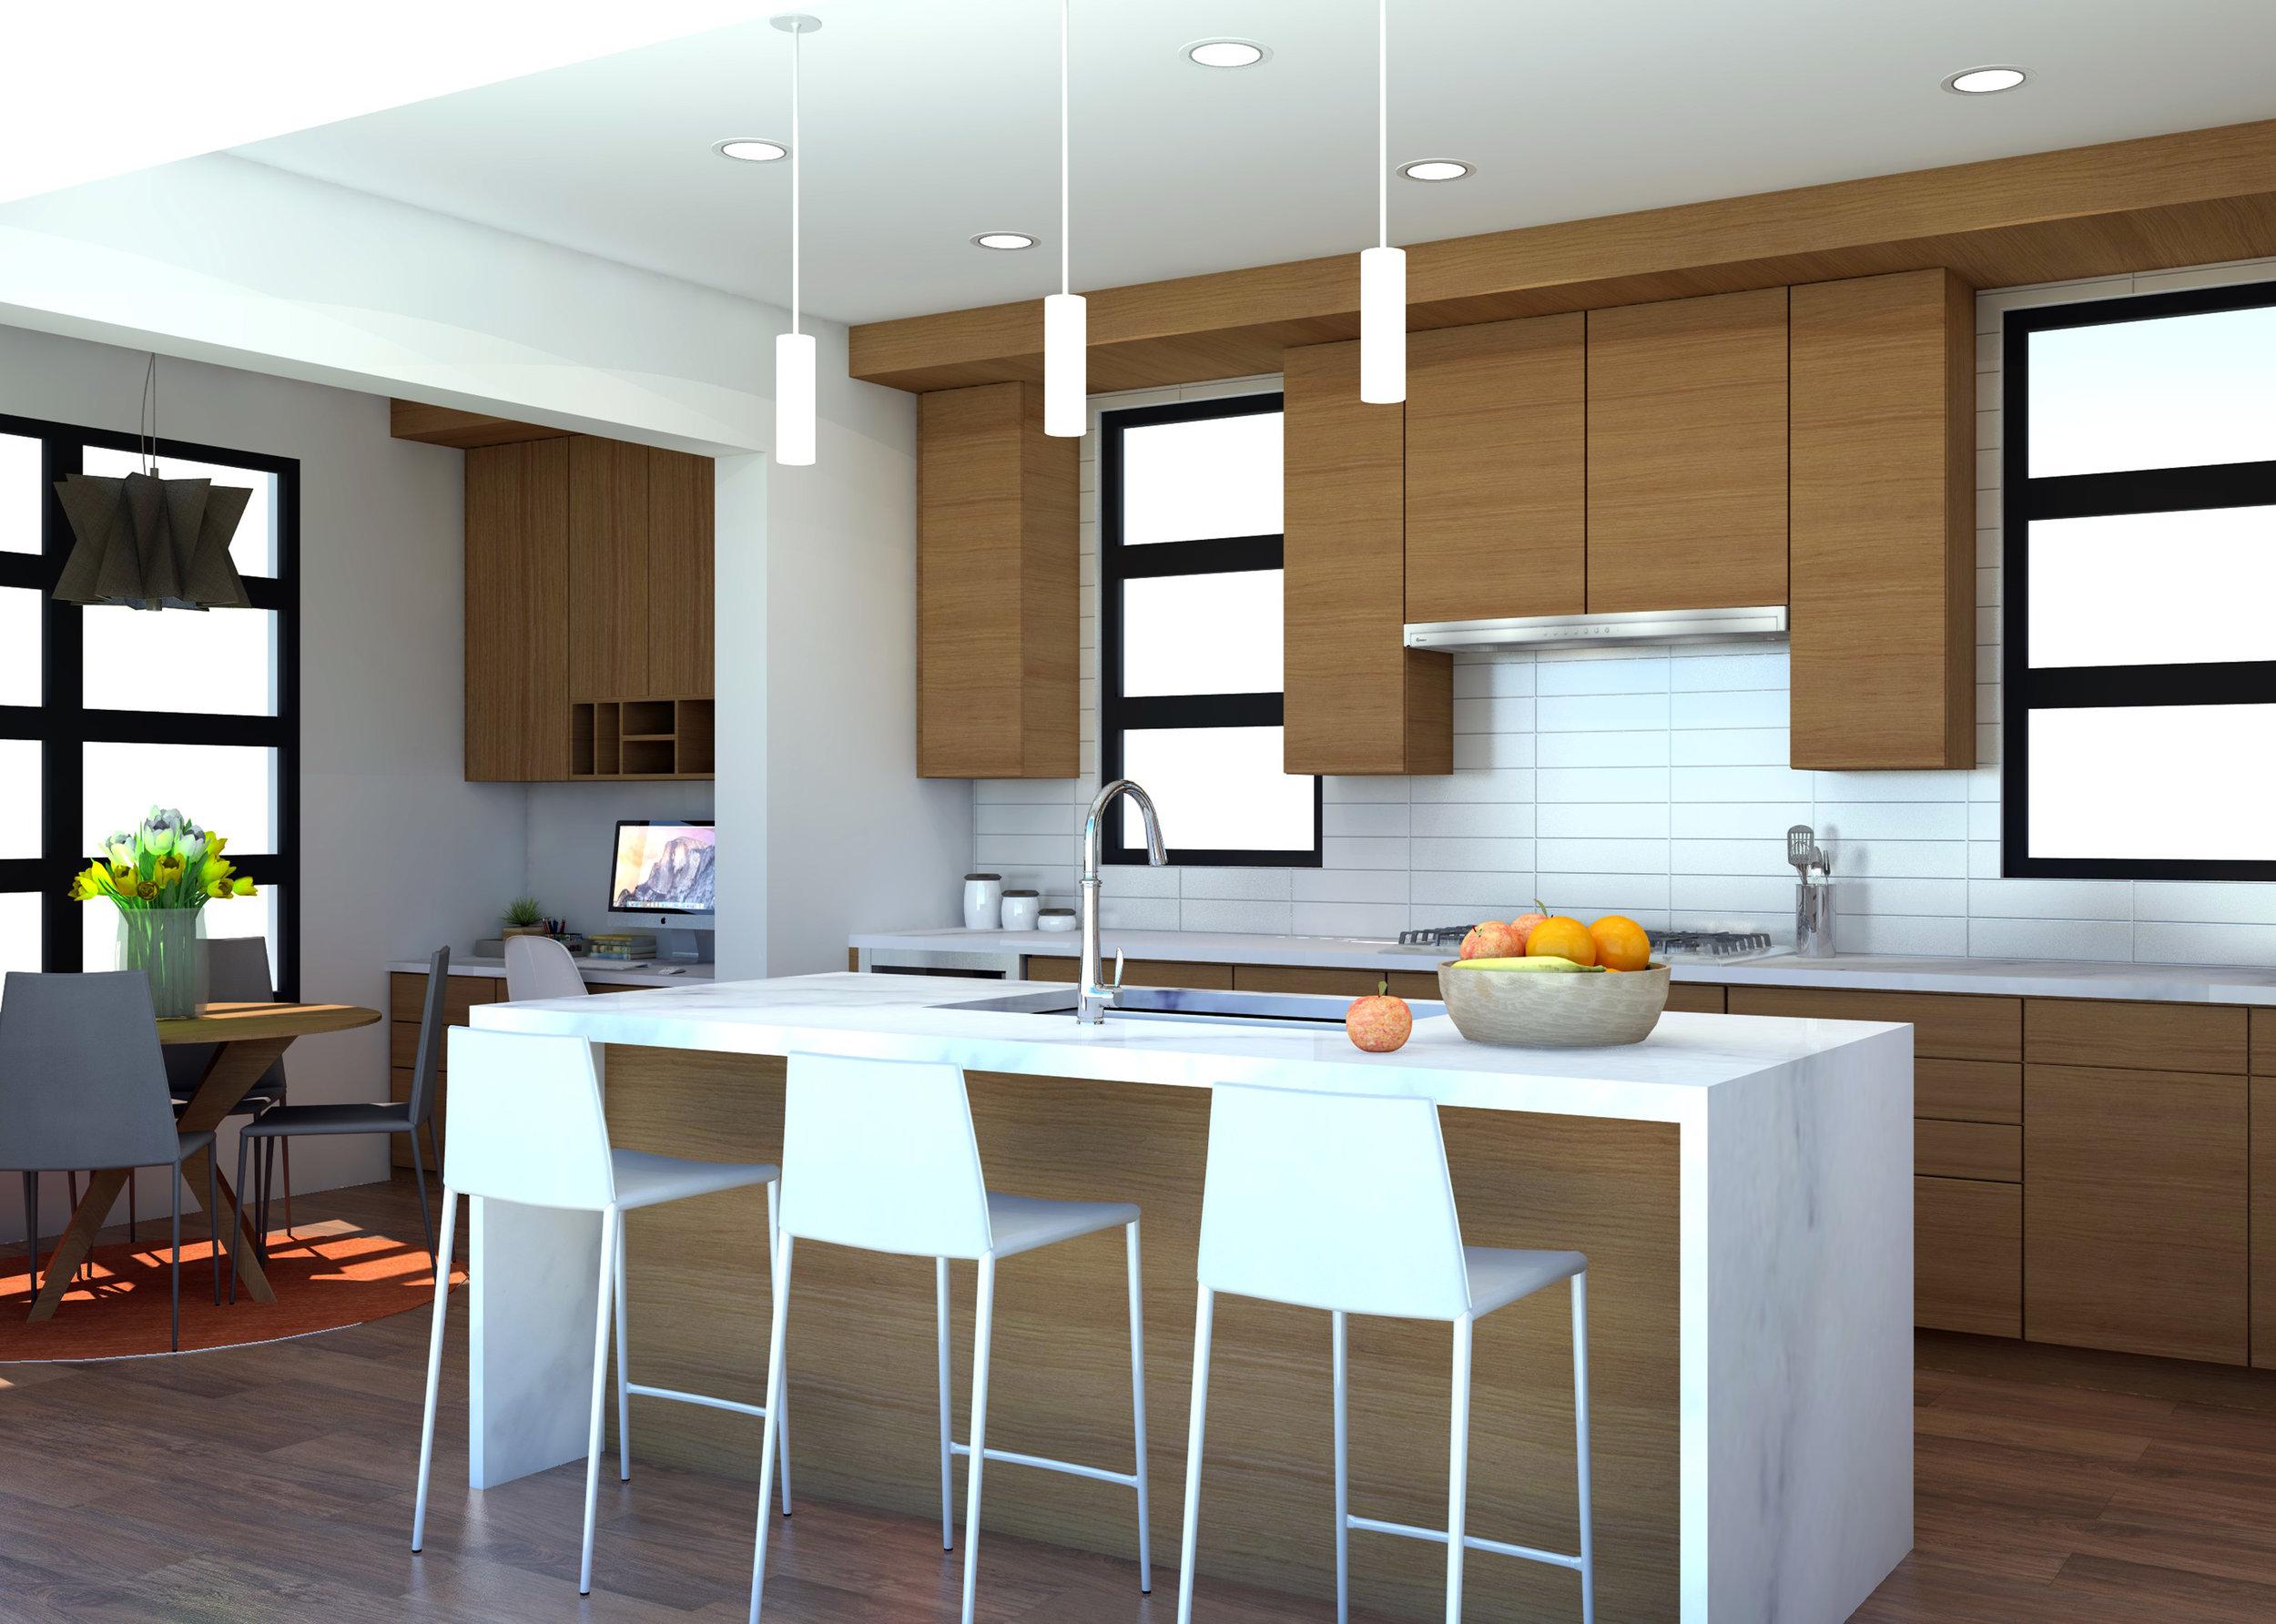 Elysian Way Interior Plan  - Kitchen 2015-10-26 10132100000.jpg